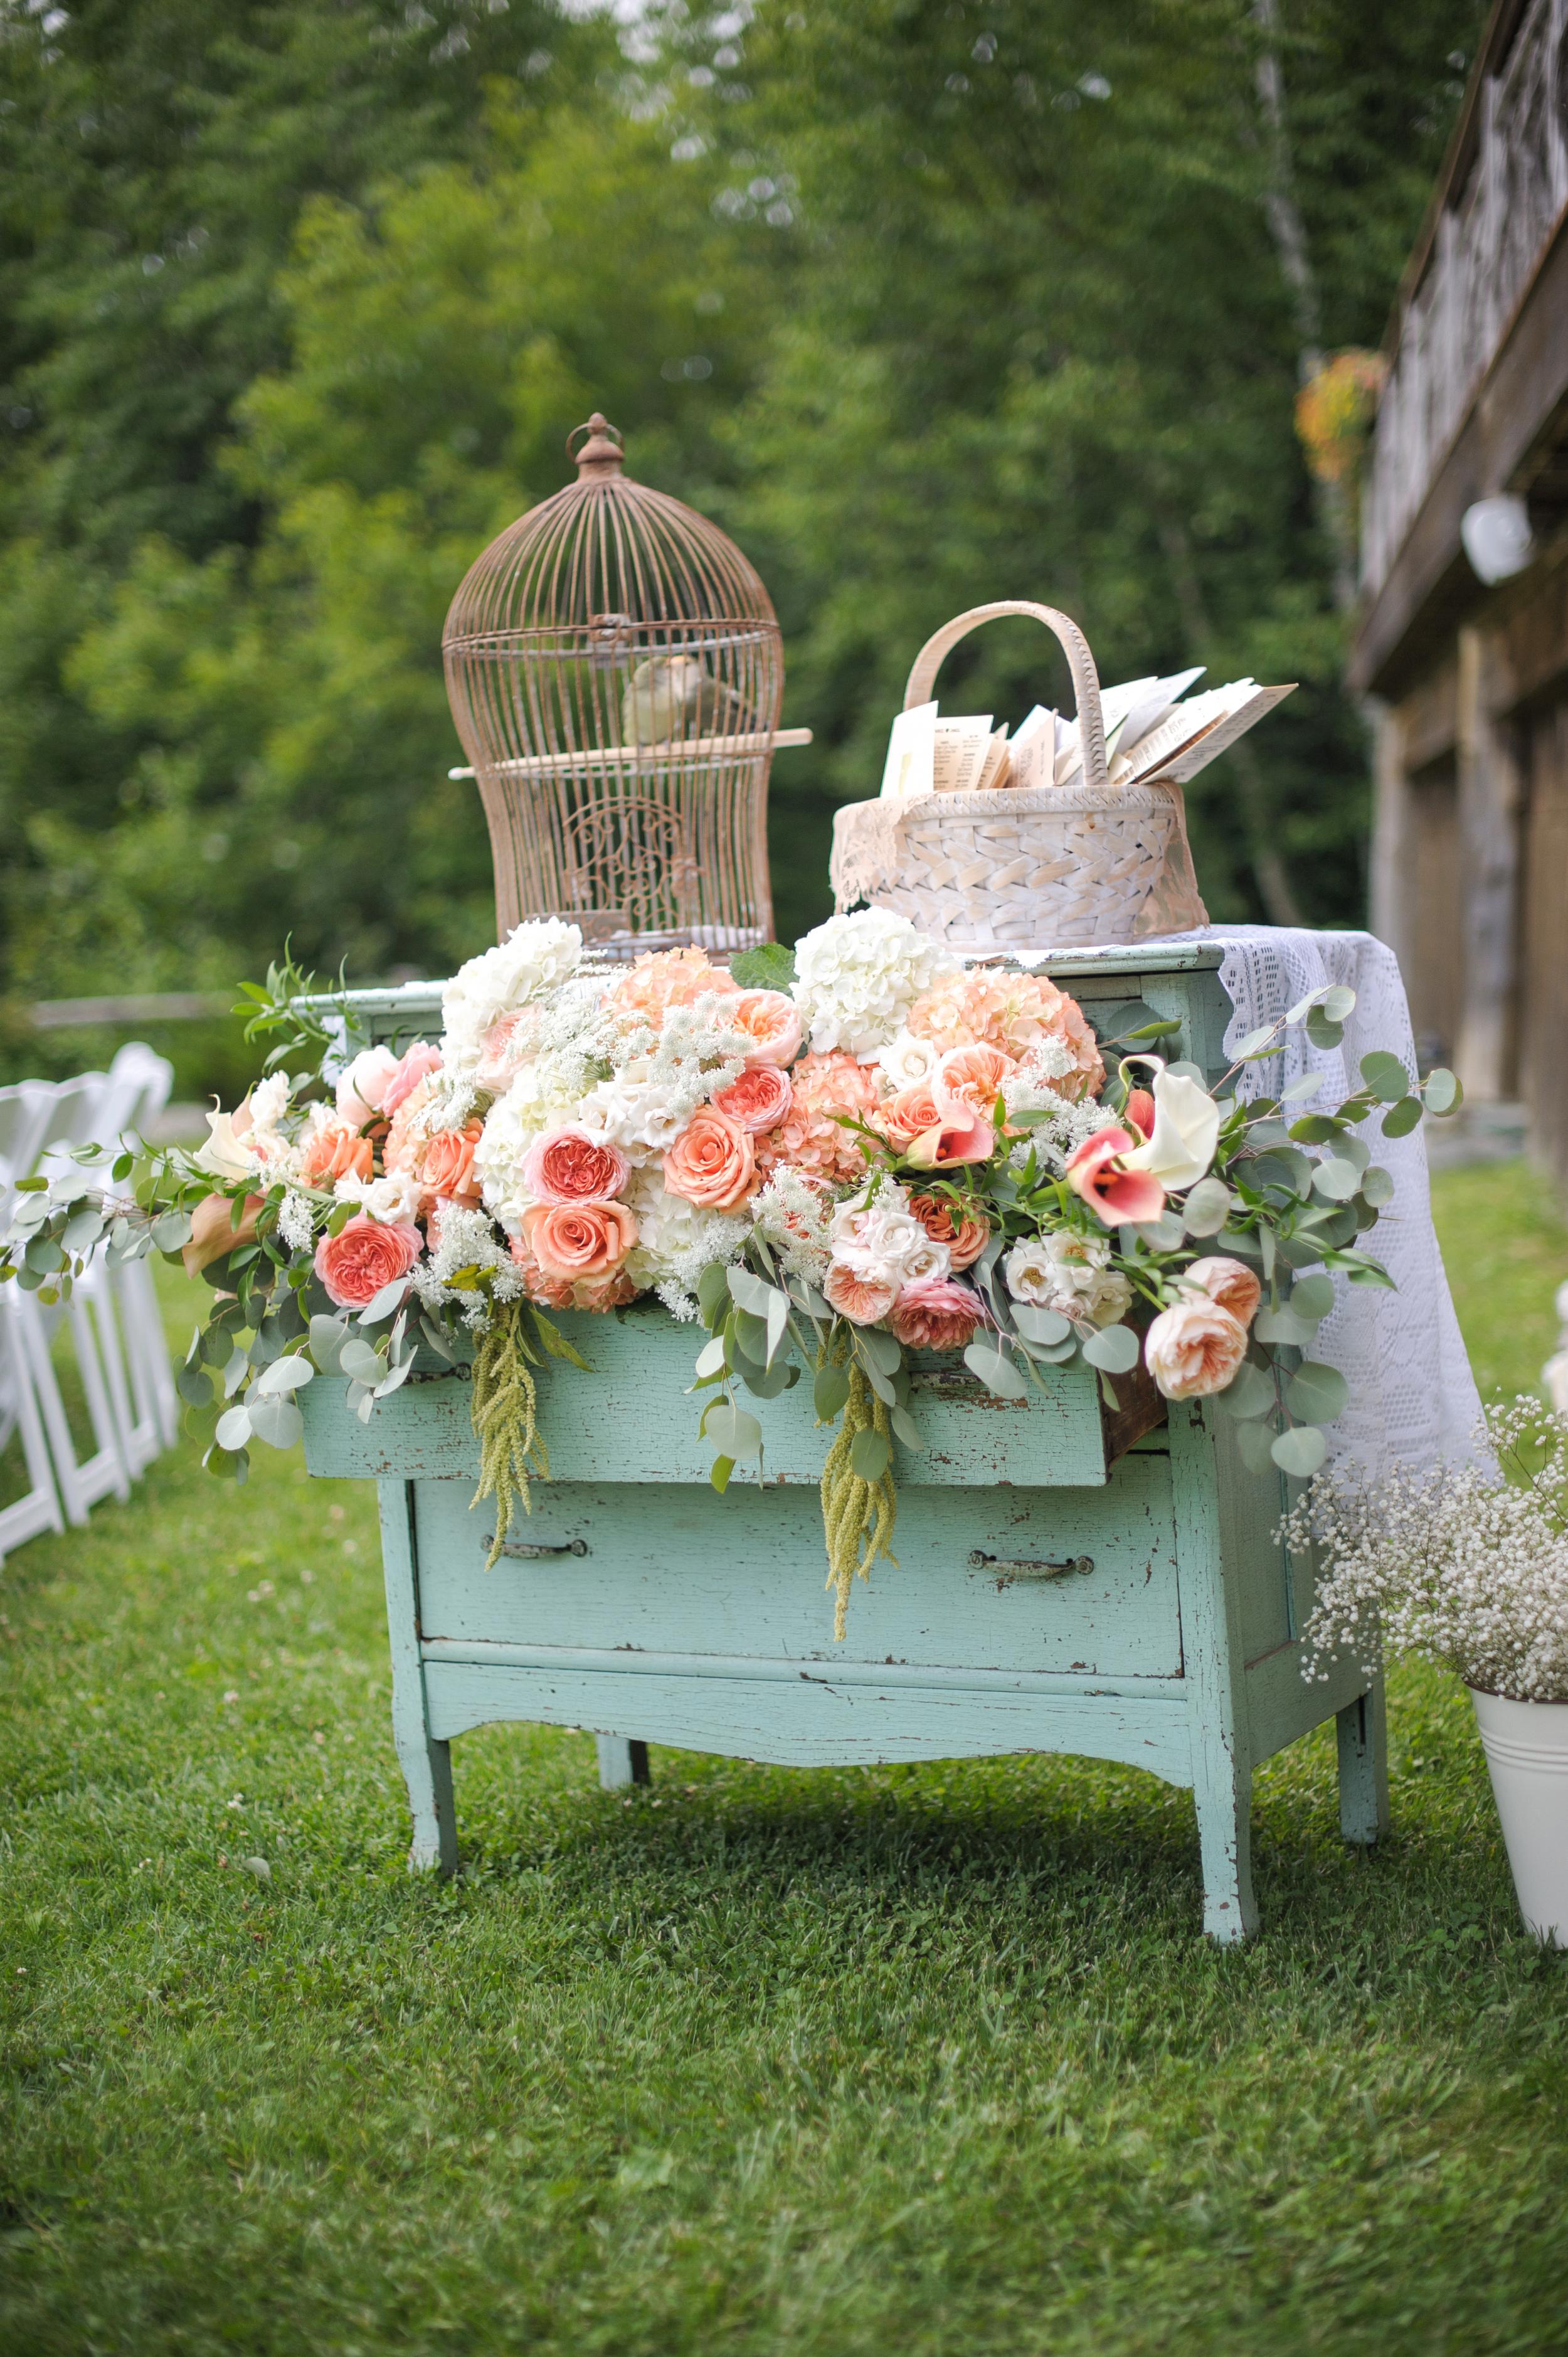 vintage_dresser_and_birdcage_filled_with_flowers_for_wedding